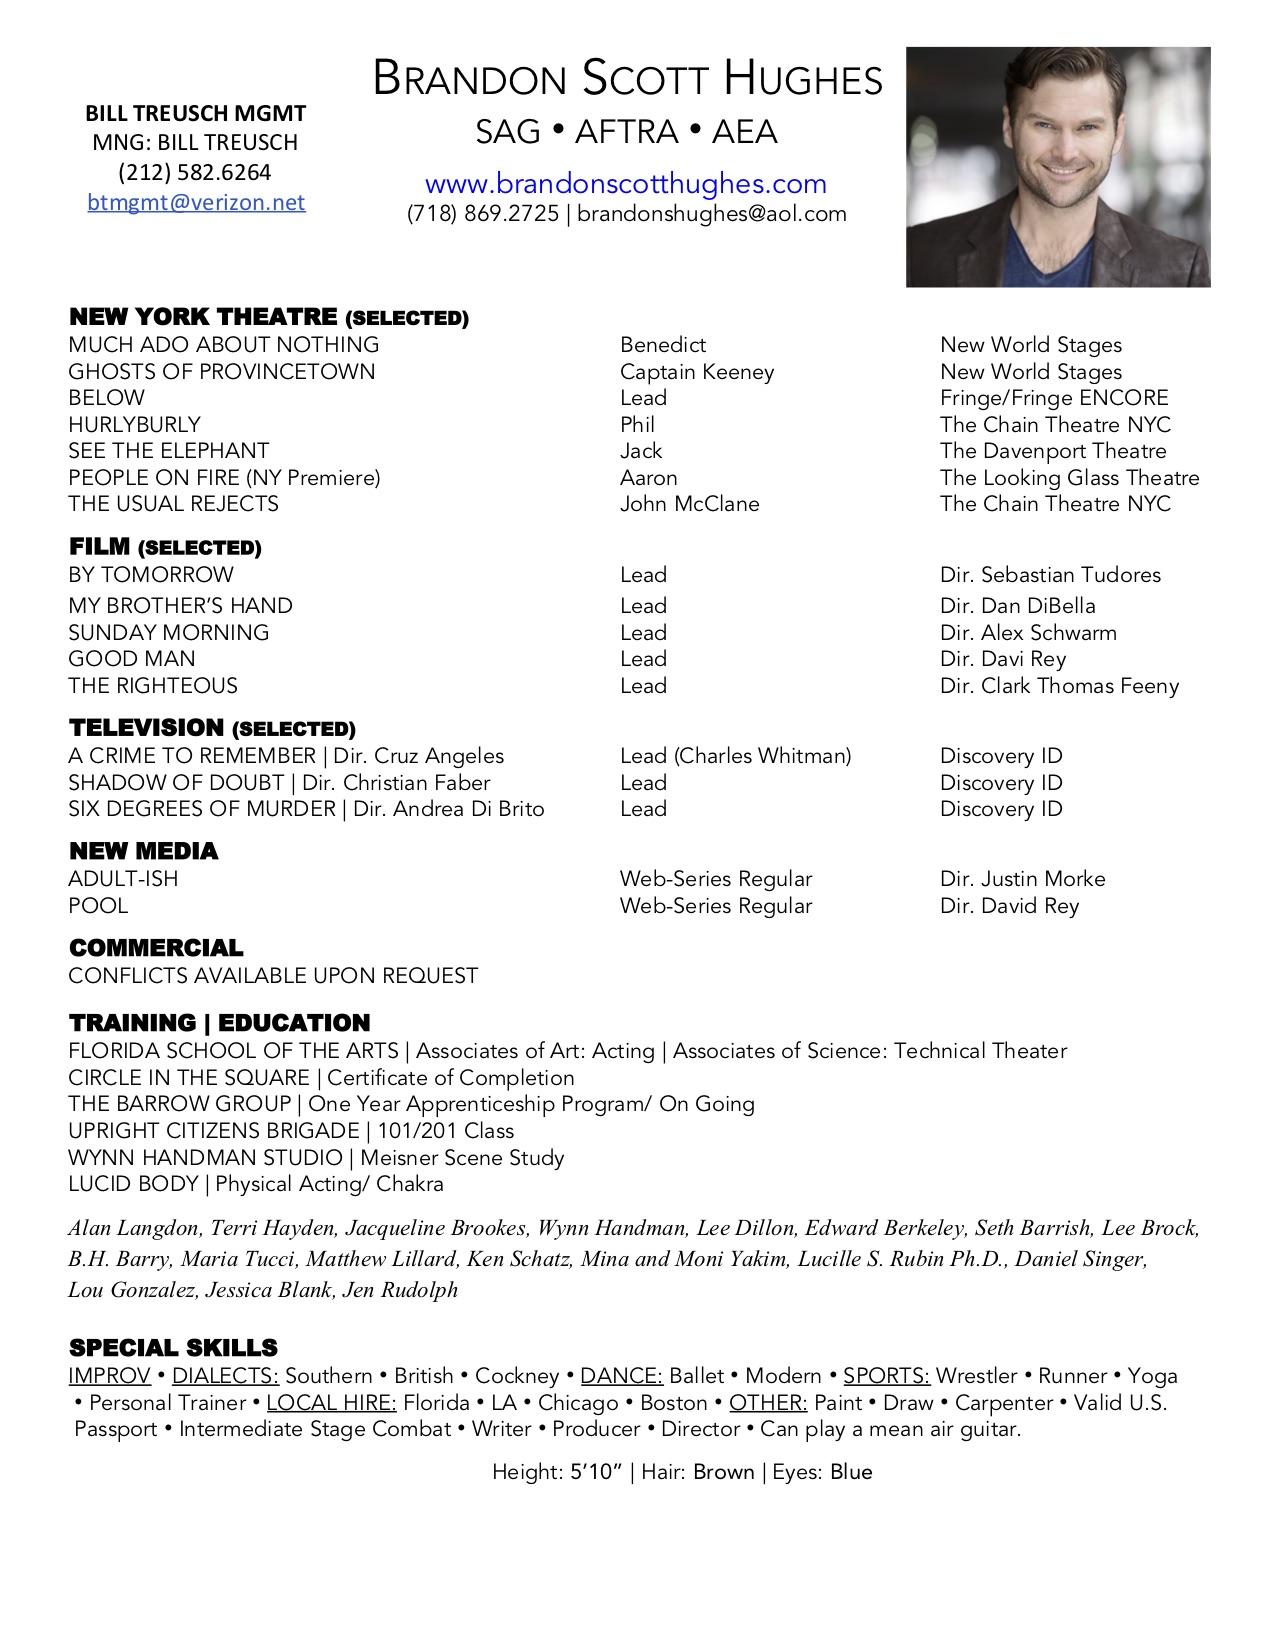 Brandon_Scott_Hughes_Resume.jpg